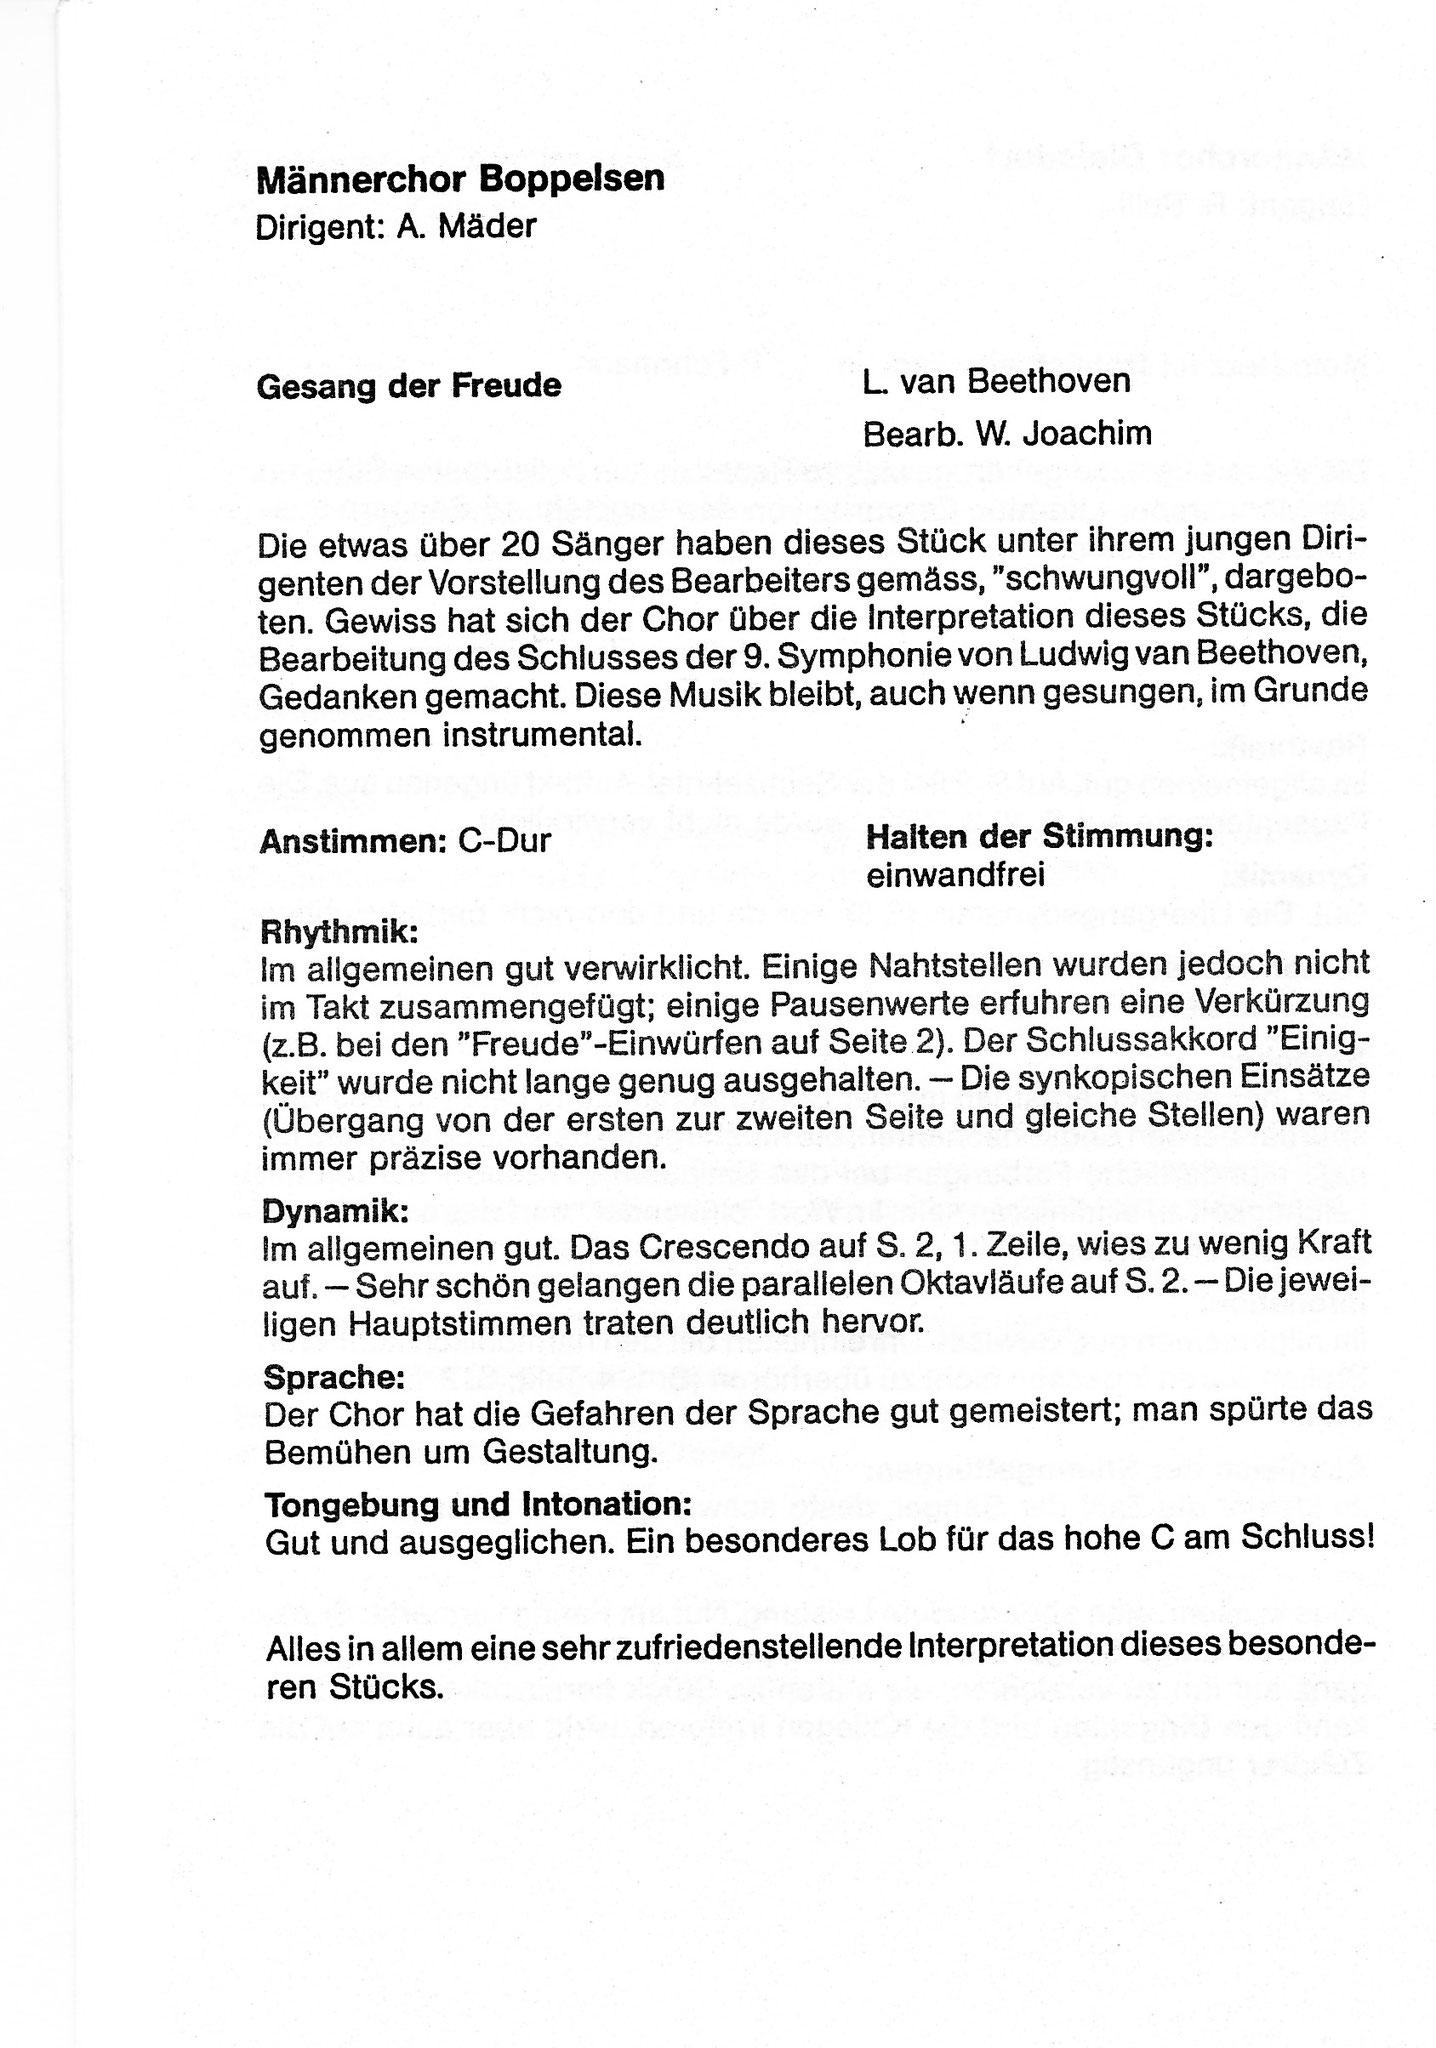 Expertenbericht::Sängertag 1983 Niederhasli::Dirigent Adi Mäder